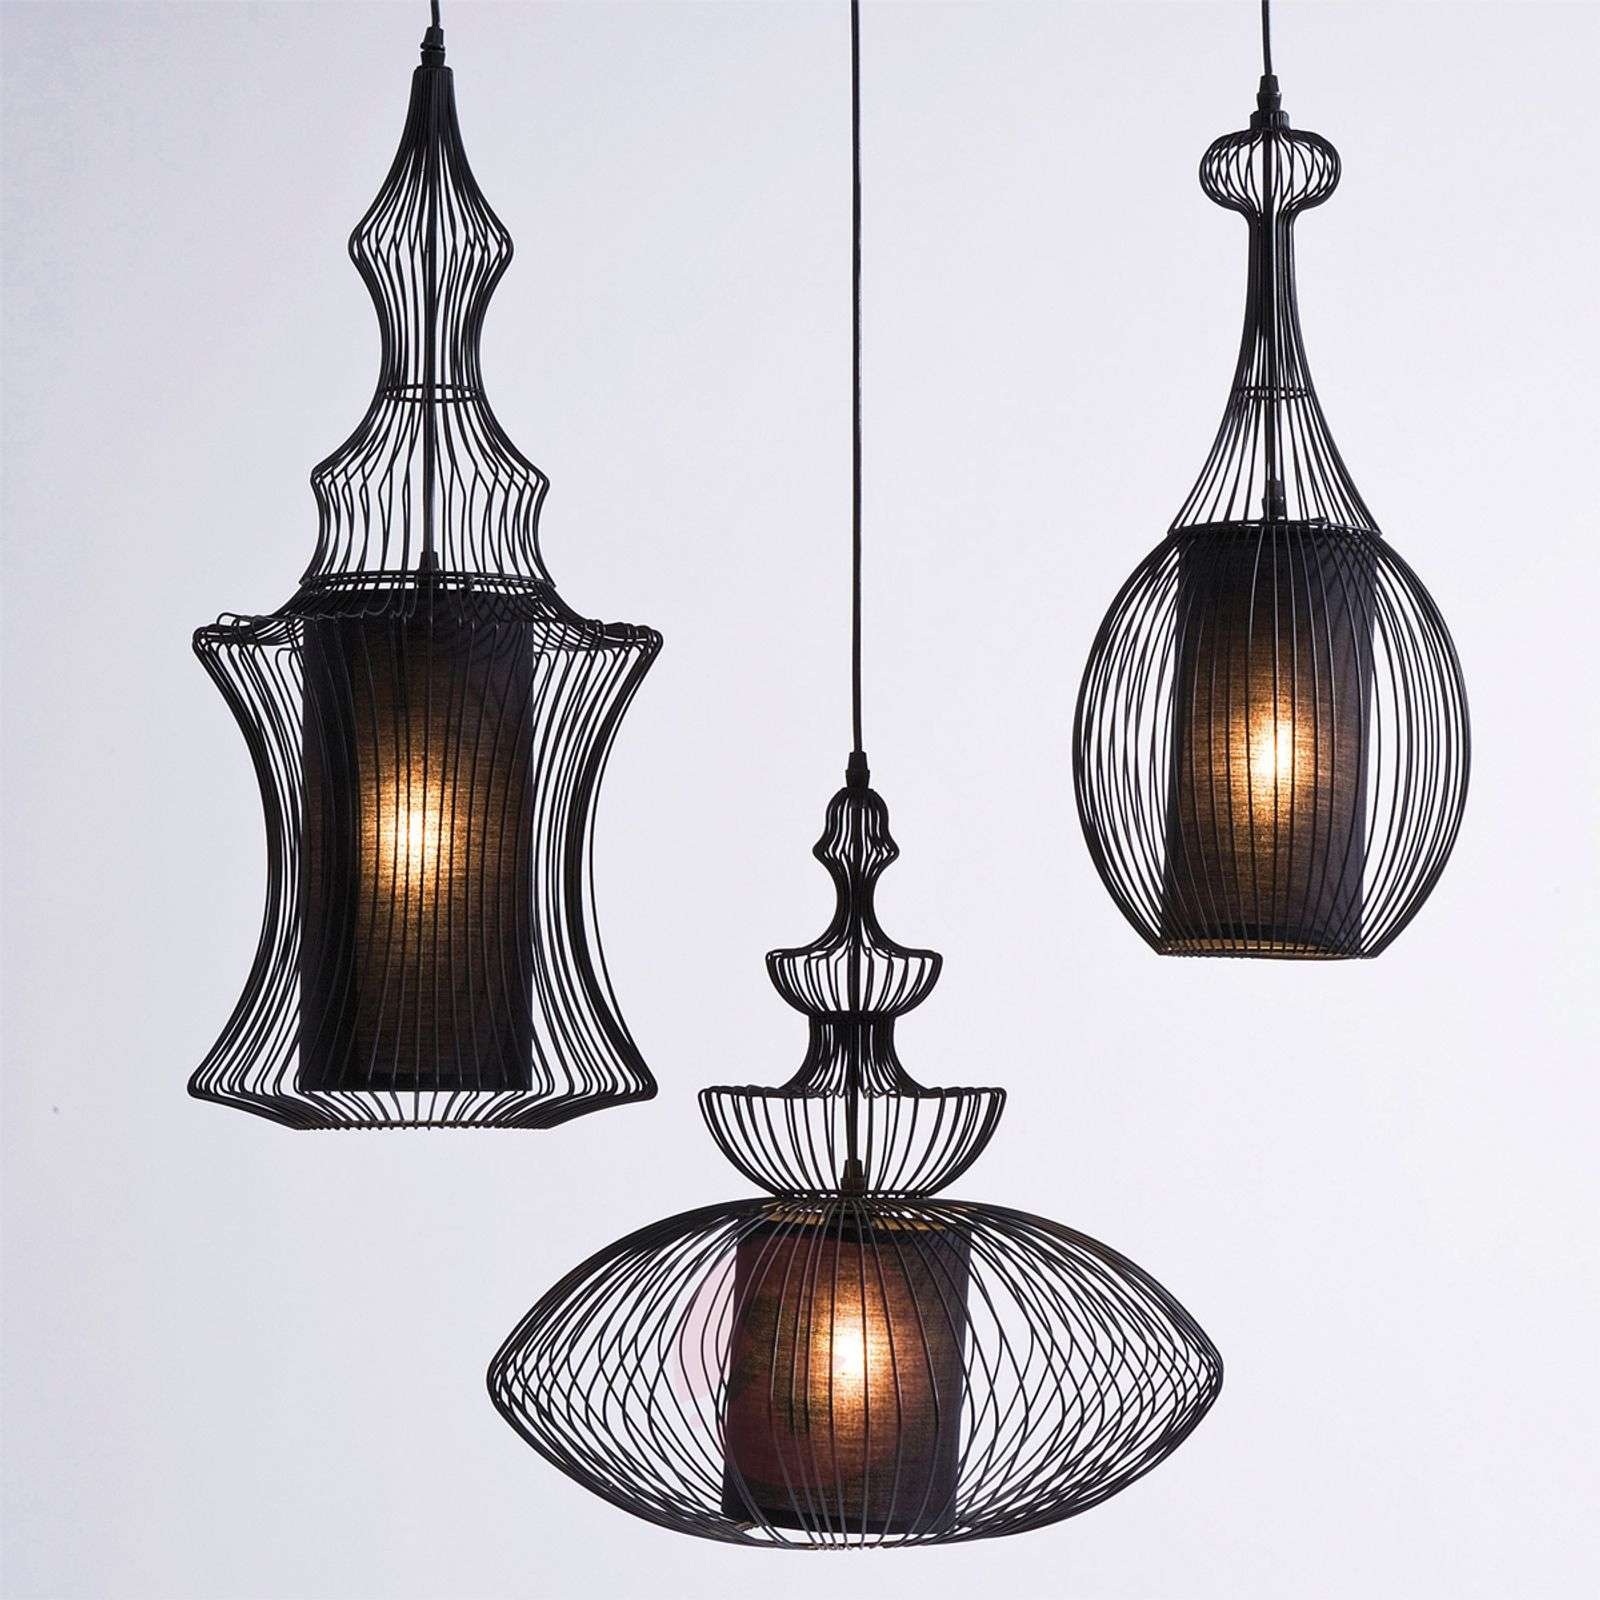 KARE Swing Iron Tre opulent hanging light-5517172-01